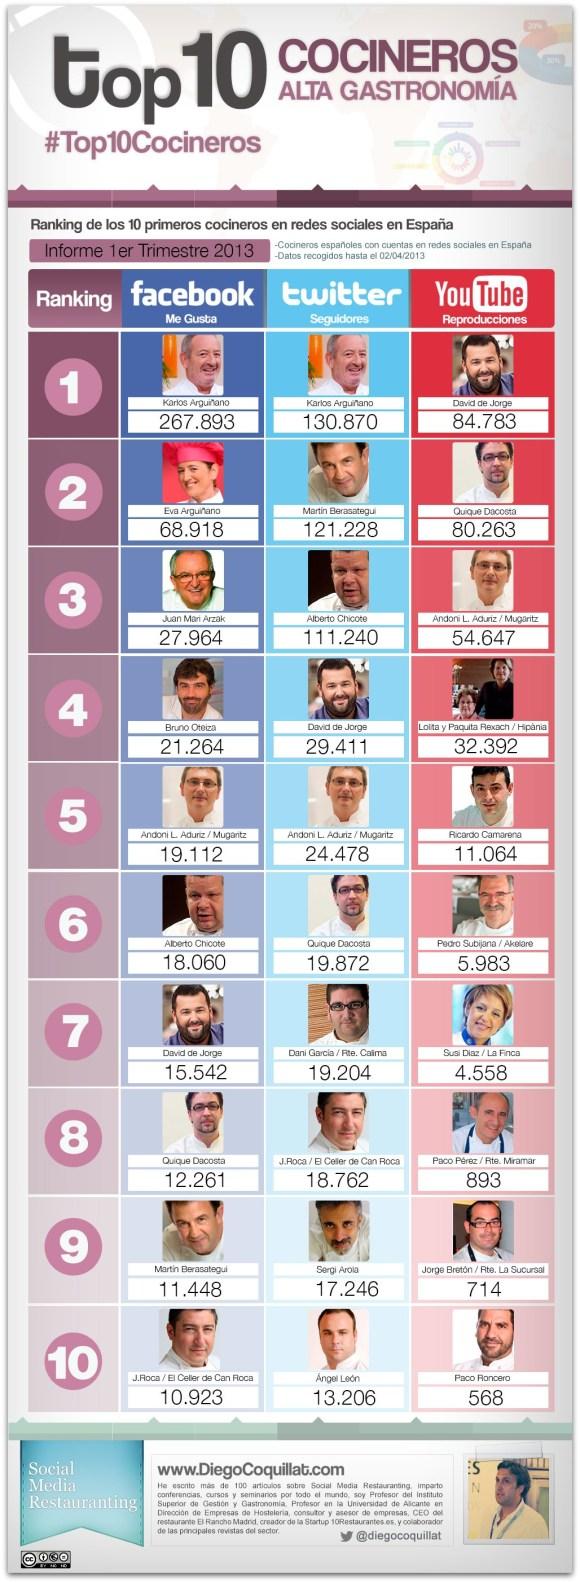 Ranking best chefs in social networks in Spain 2013